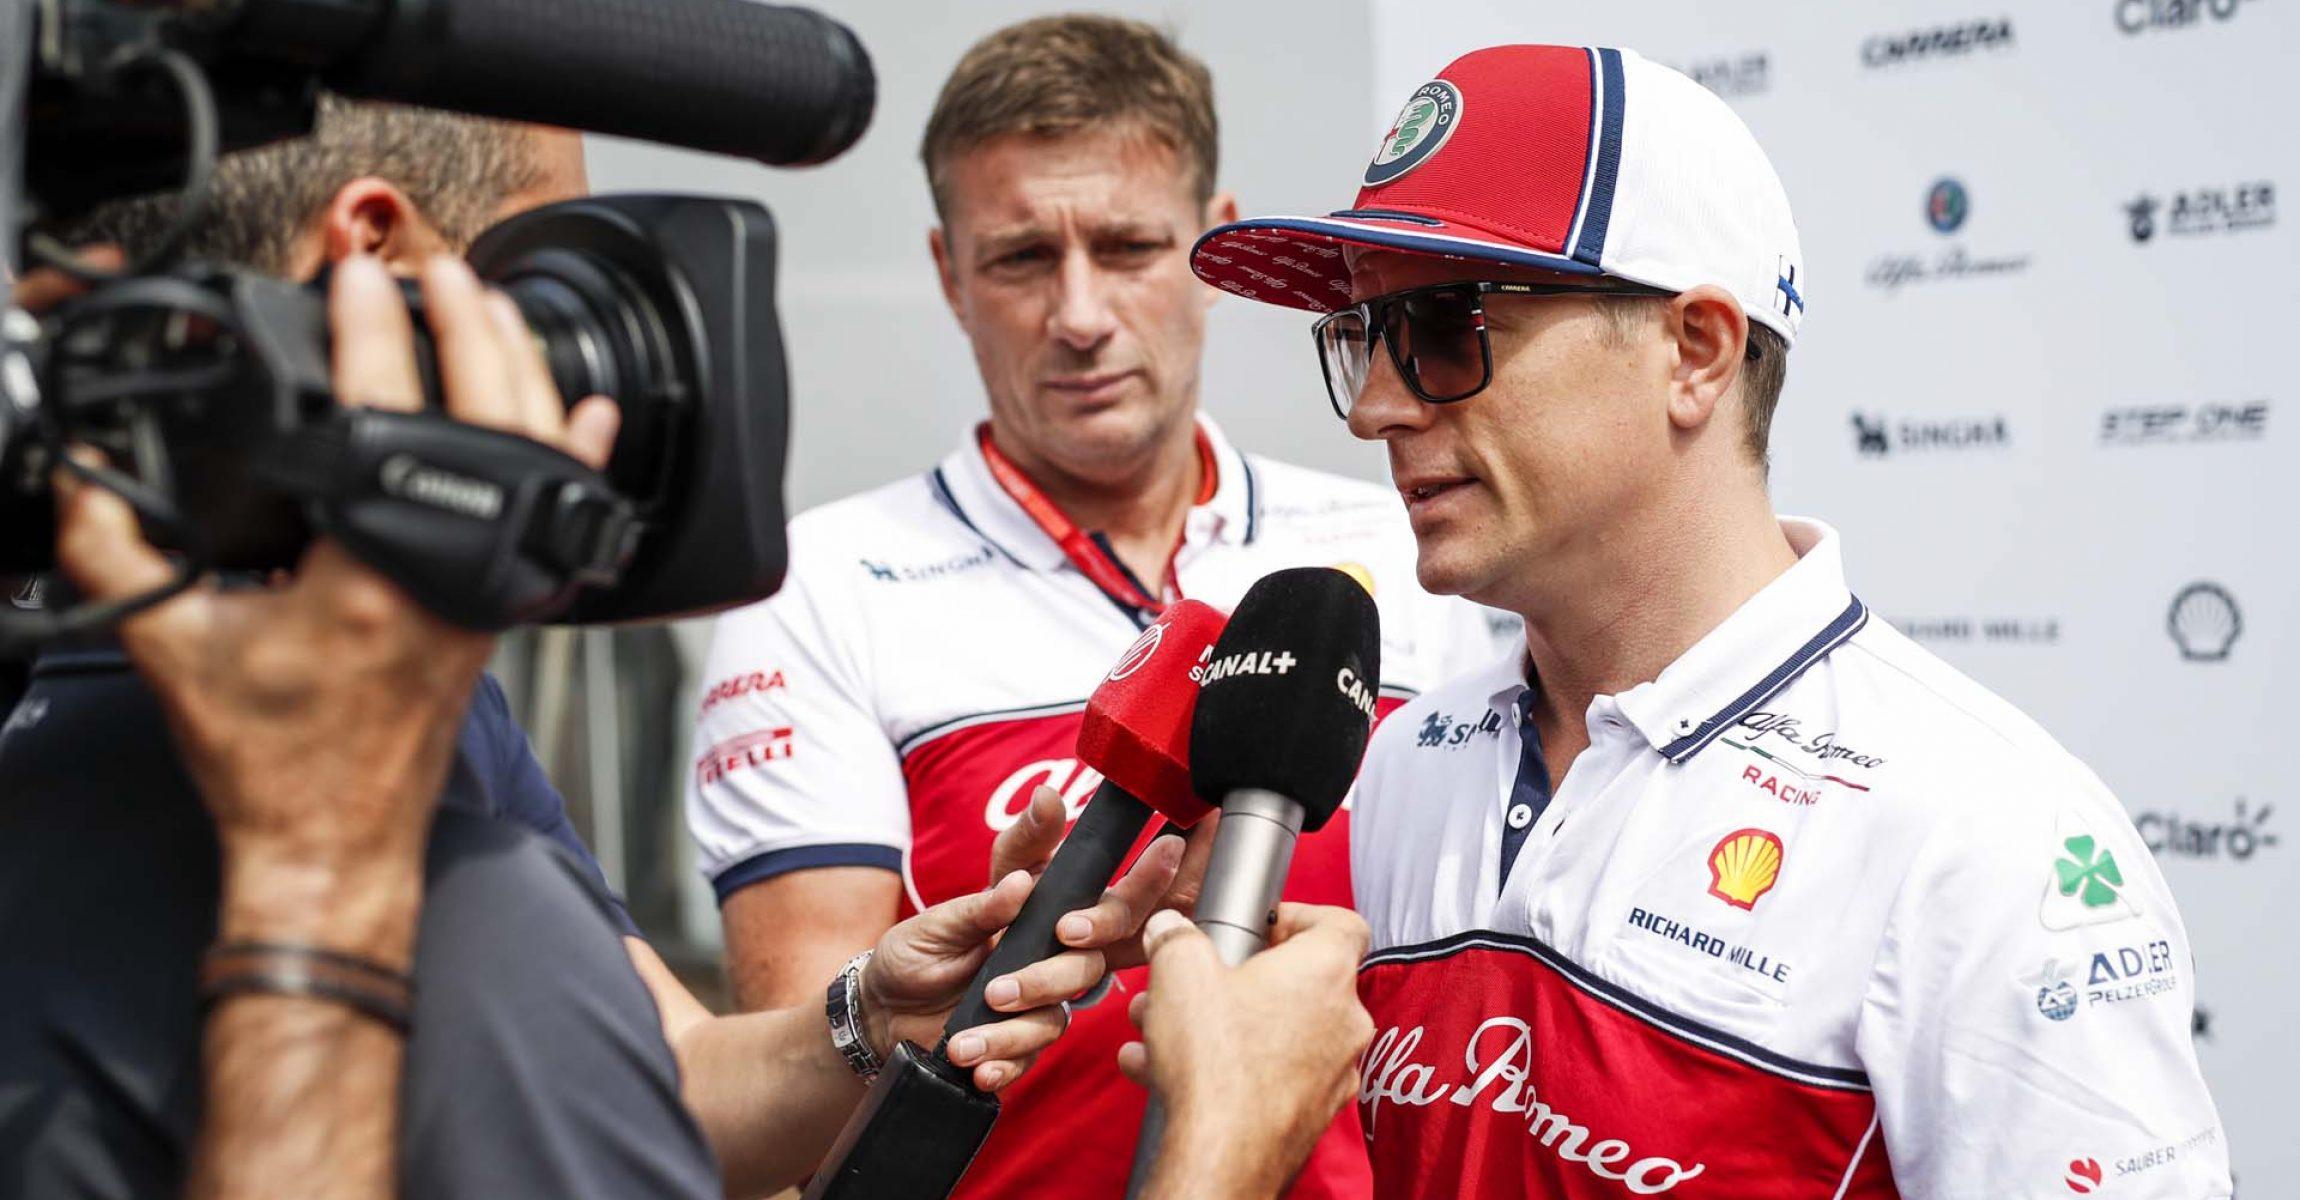 RAIKKONEN Kimi Räikkönen (fin), Alfa Romeo Racing C38, portrait interview Canal+ during 2019 Formula 1 FIA world championship, Italy Grand Prix, at Monza from september 5 to 9  - Photo Florent Gooden / DPPI